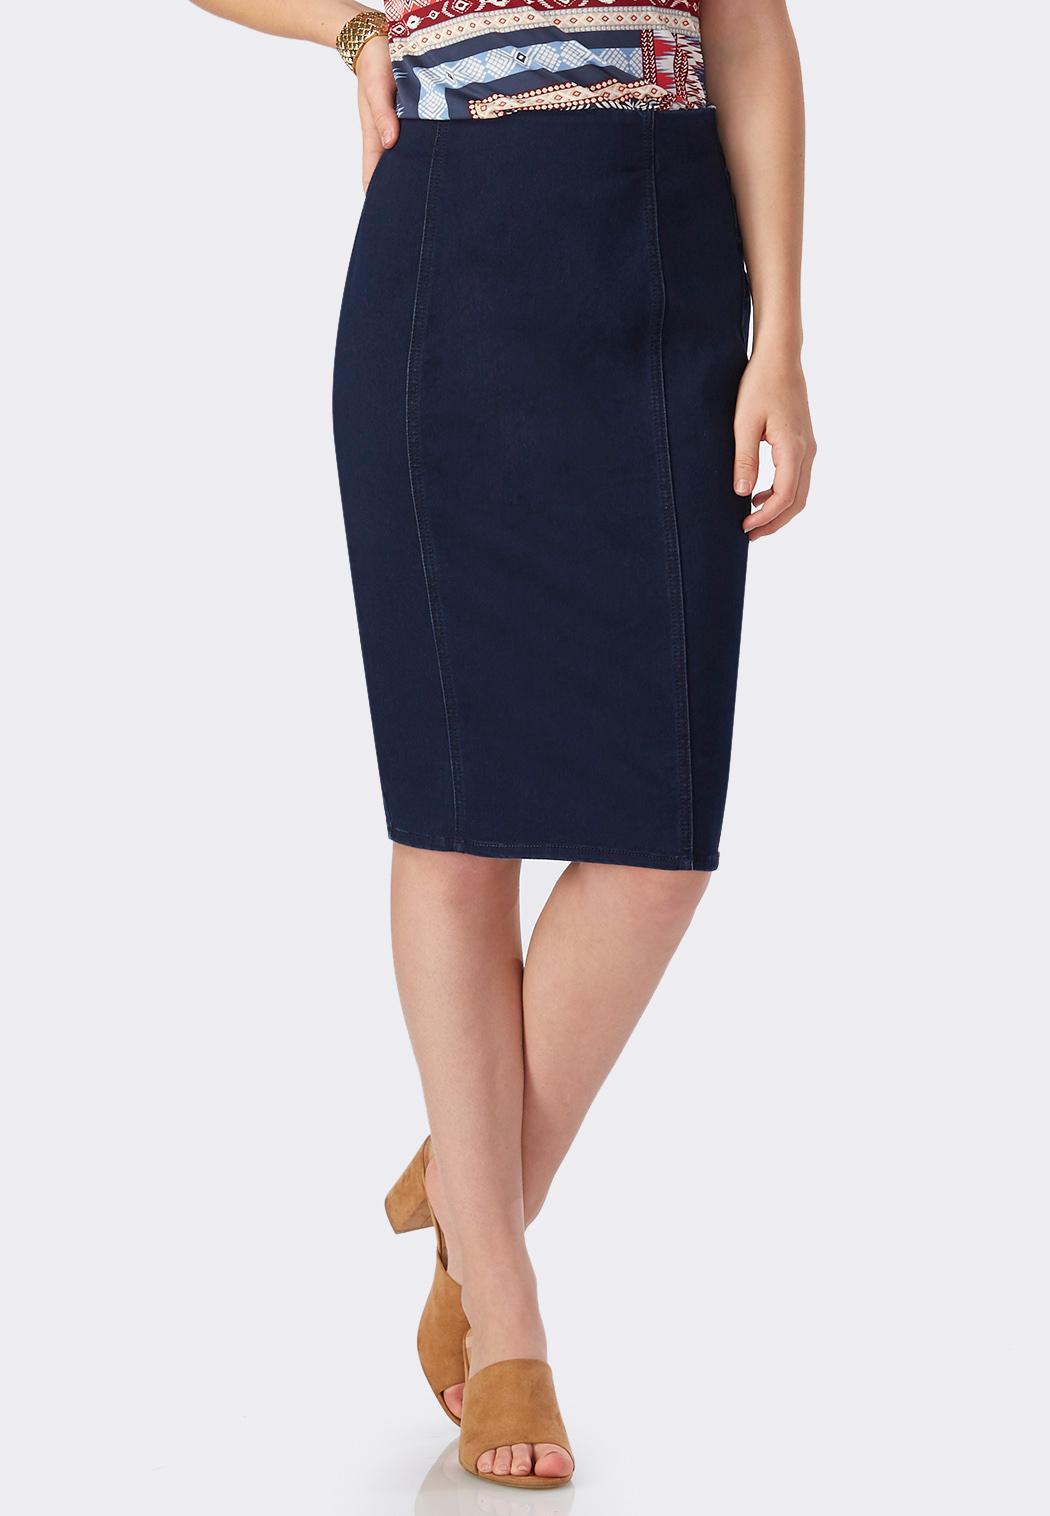 Women's Skirts | Cato Fashions